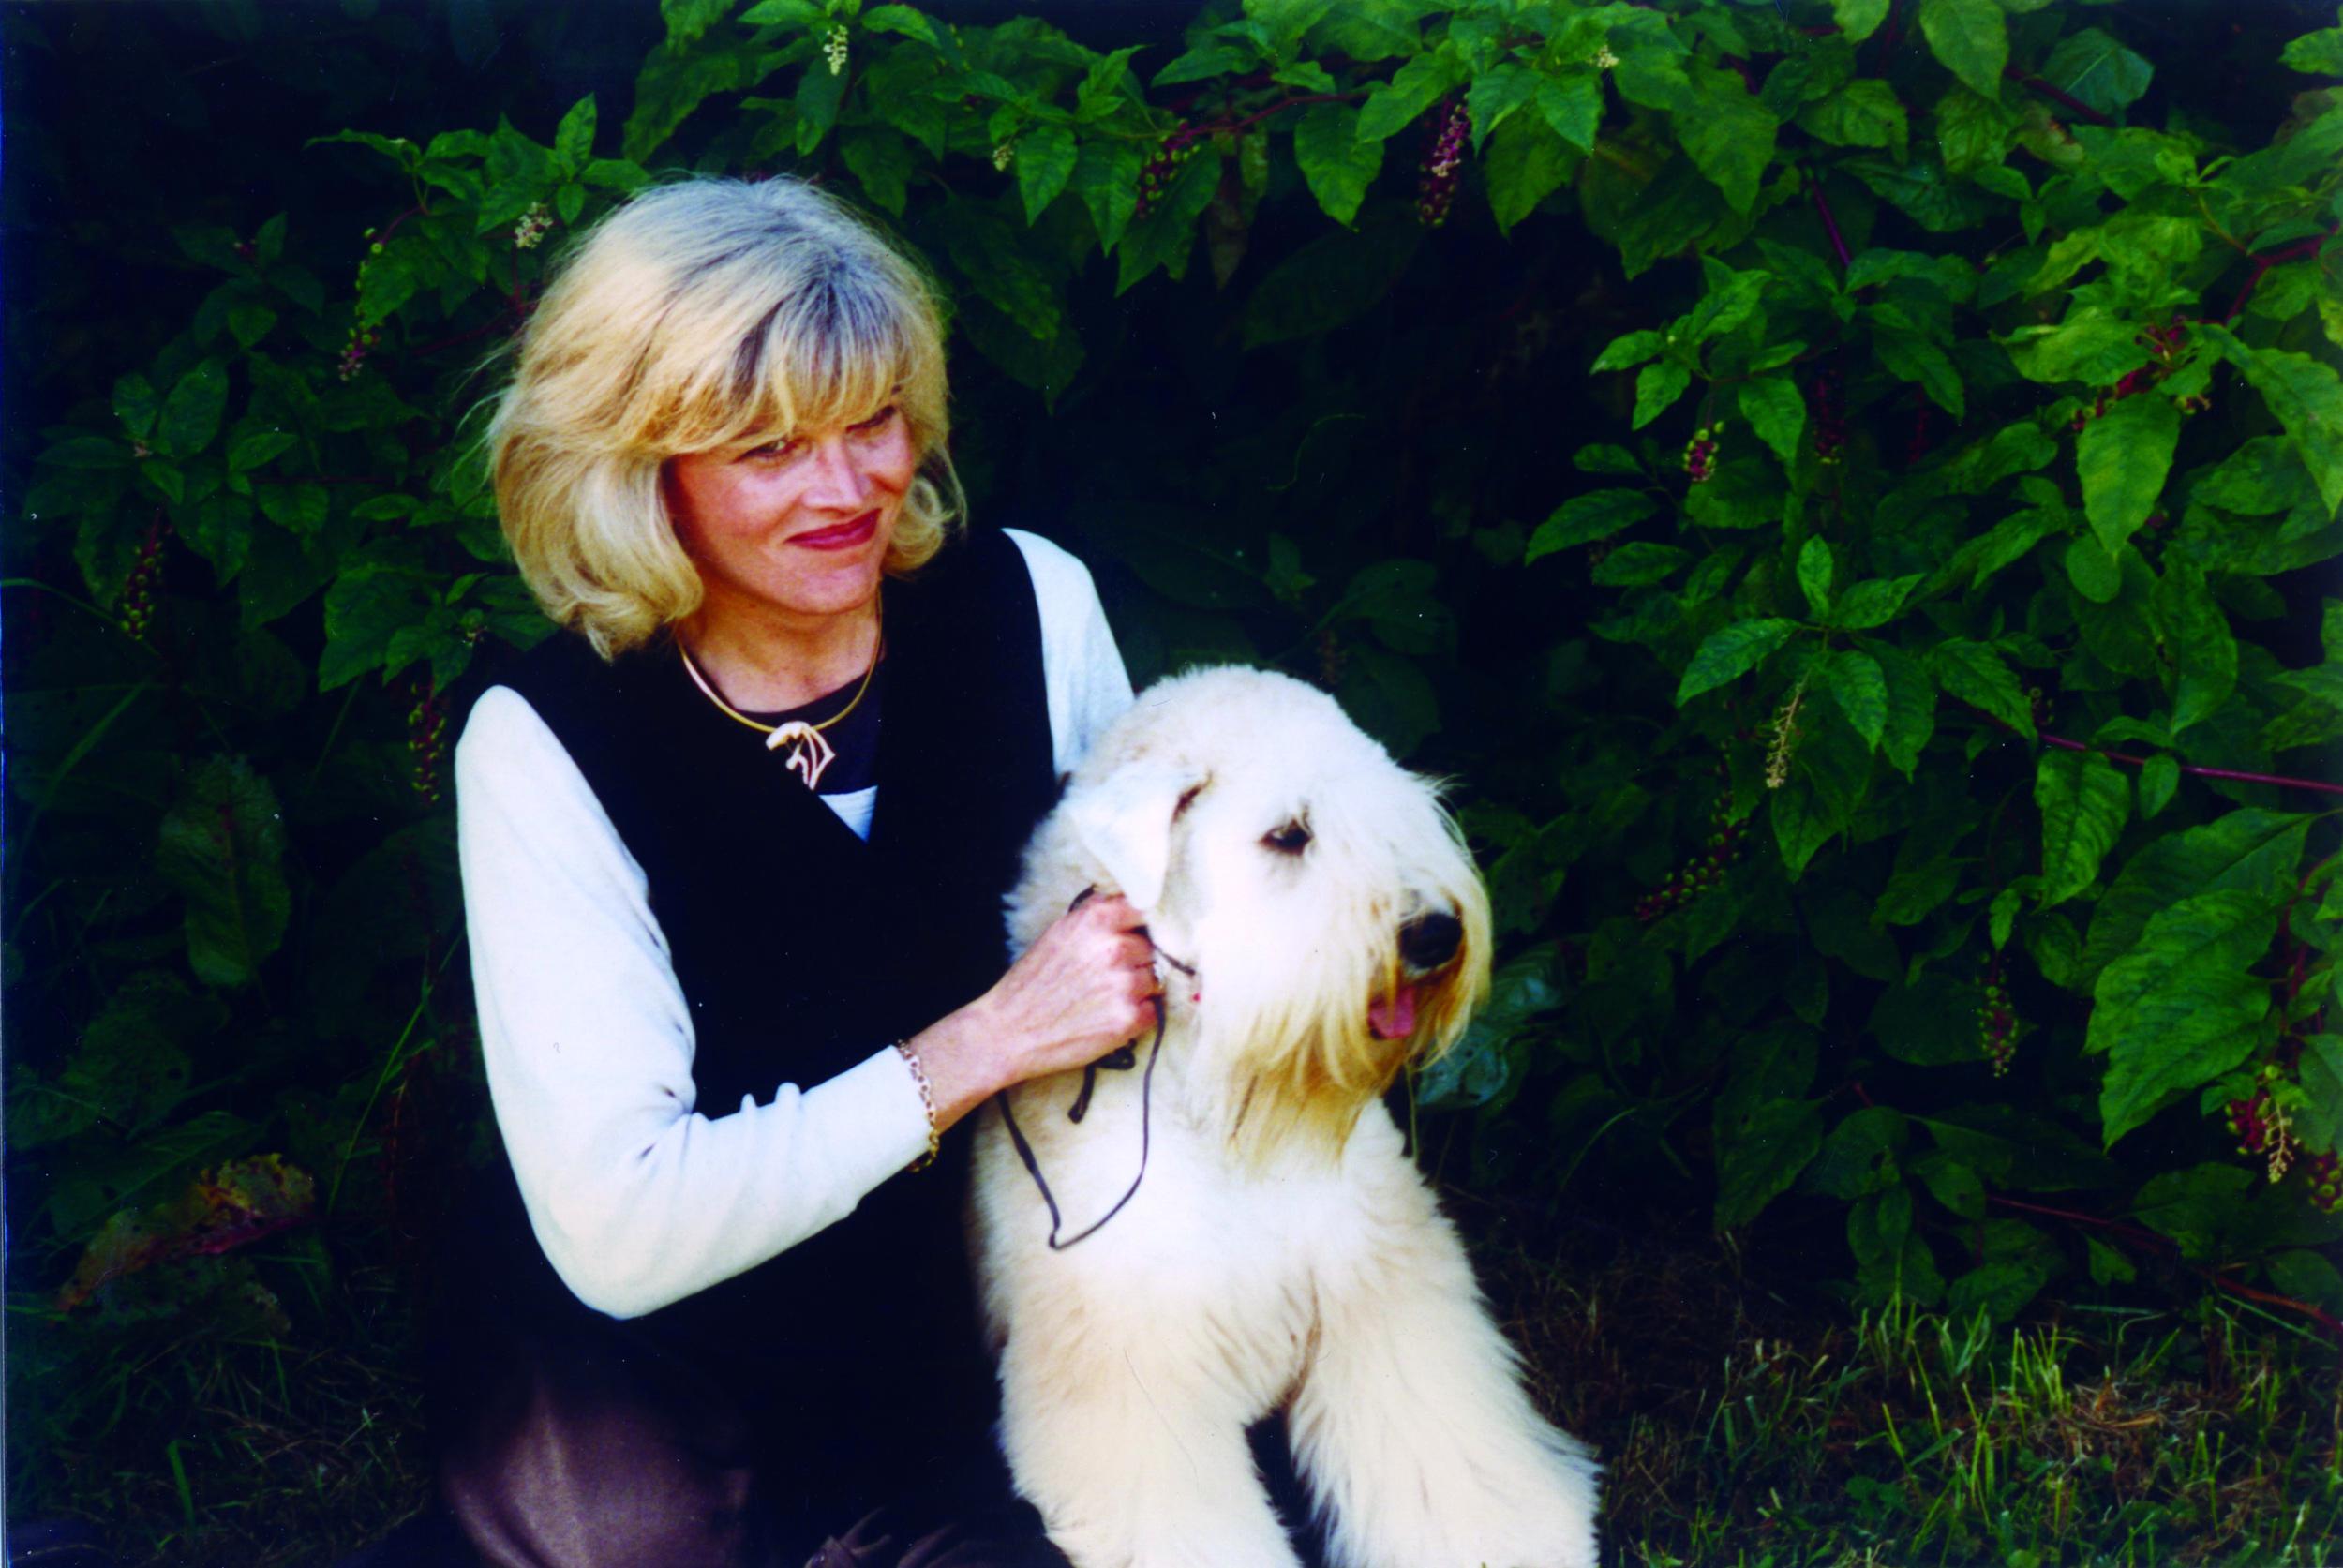 Yorkville, Dog Daycare, Grooming, Groom, Tire Biter, Playcare, Dog Walking, Kennel Free, Boarding, Toronto, Nancy, Wheaton